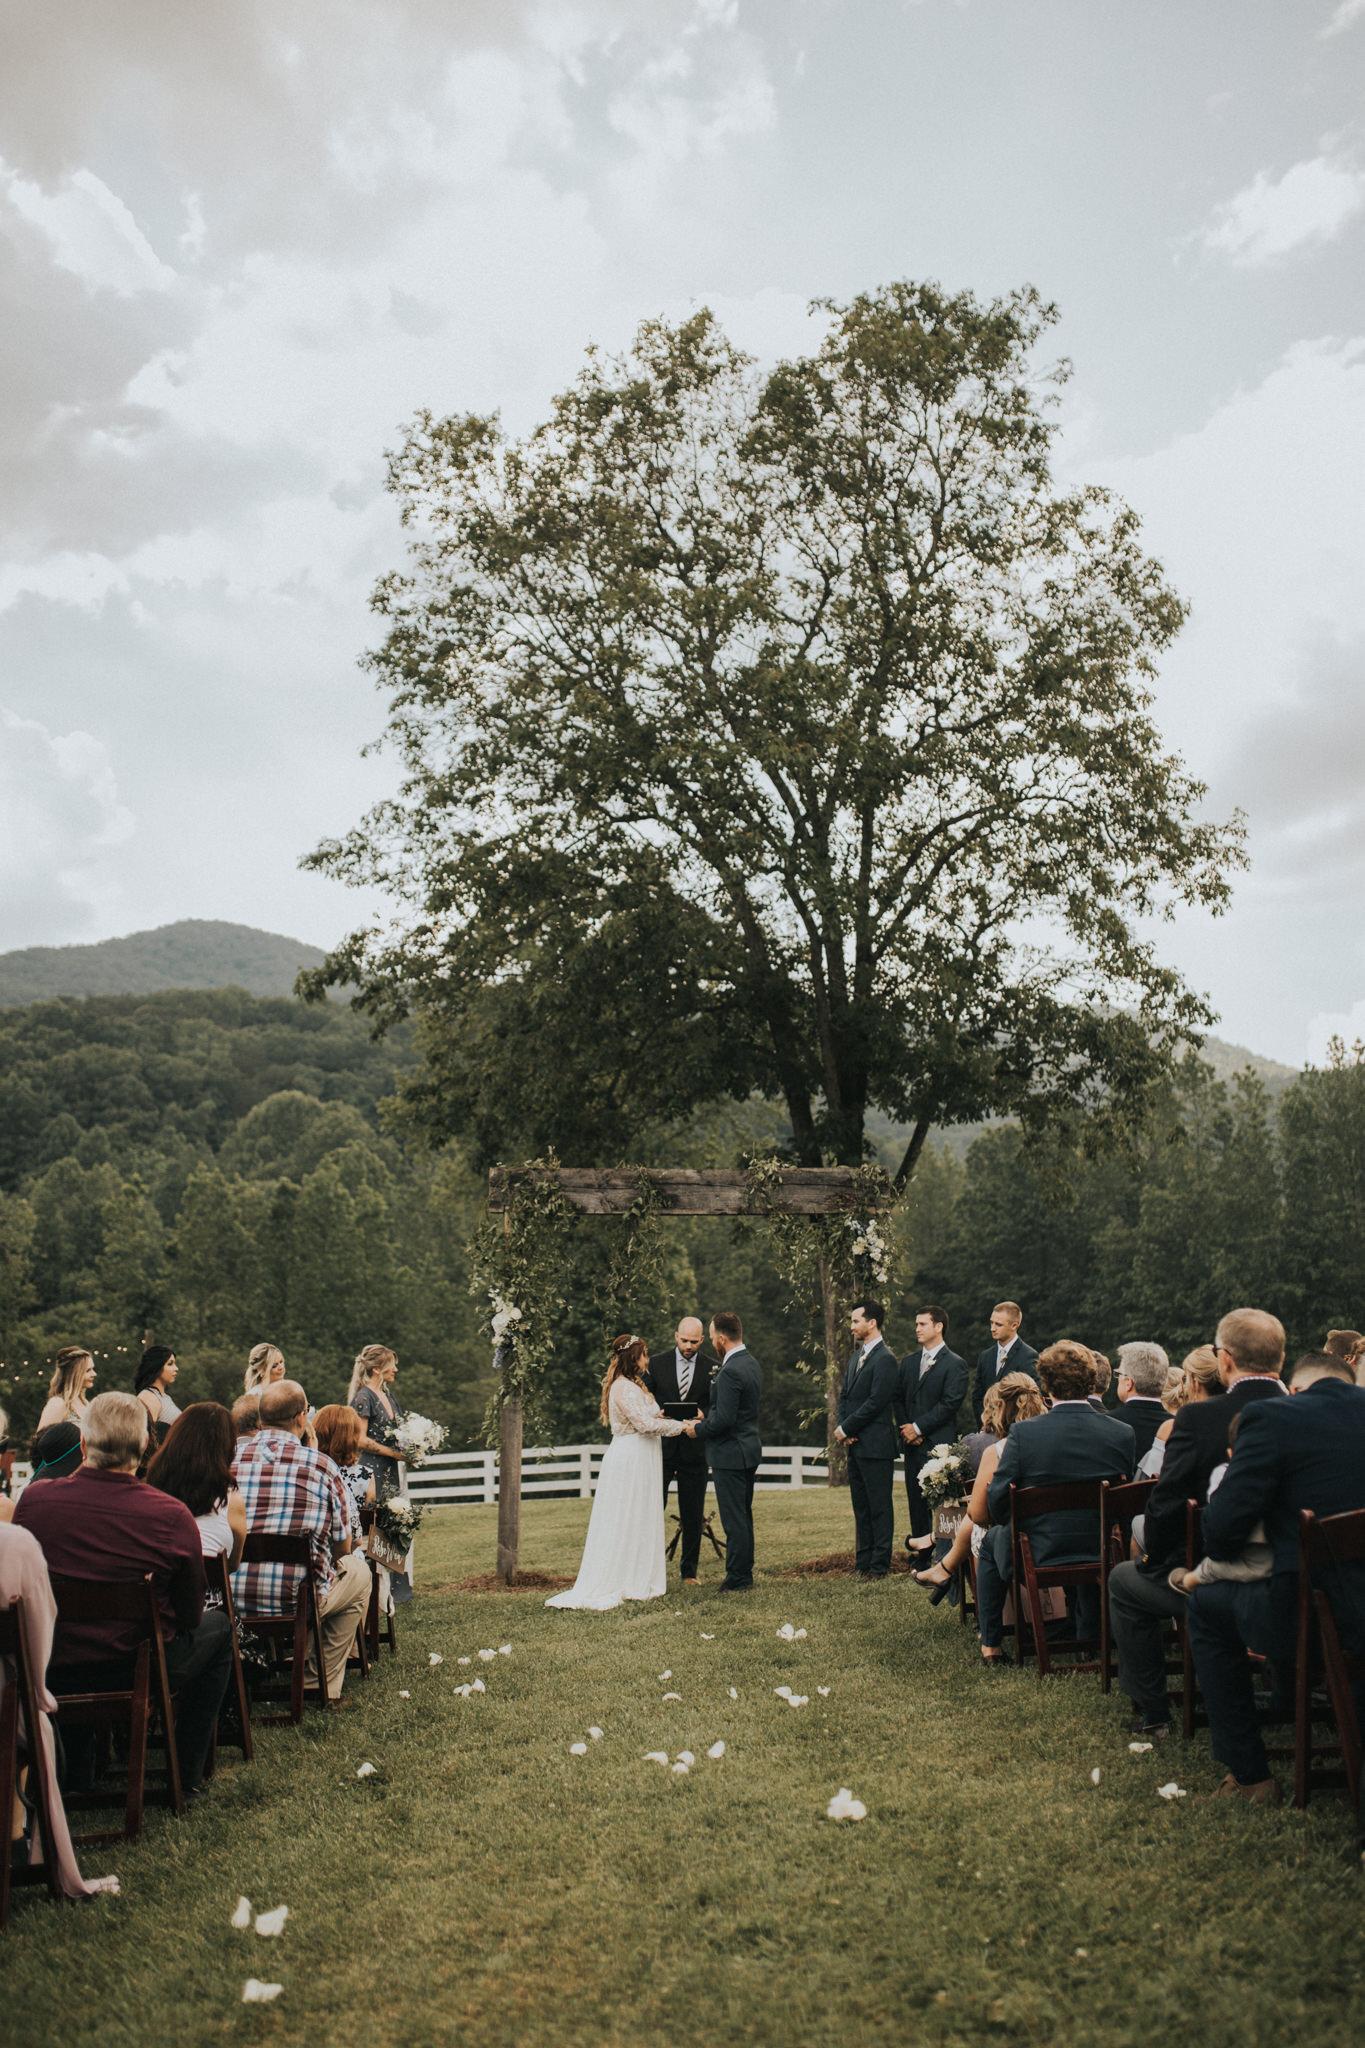 KateMatt-North-Georgia-Wedding-Photographer-Mountain-Laurel-Farm-104.jpg